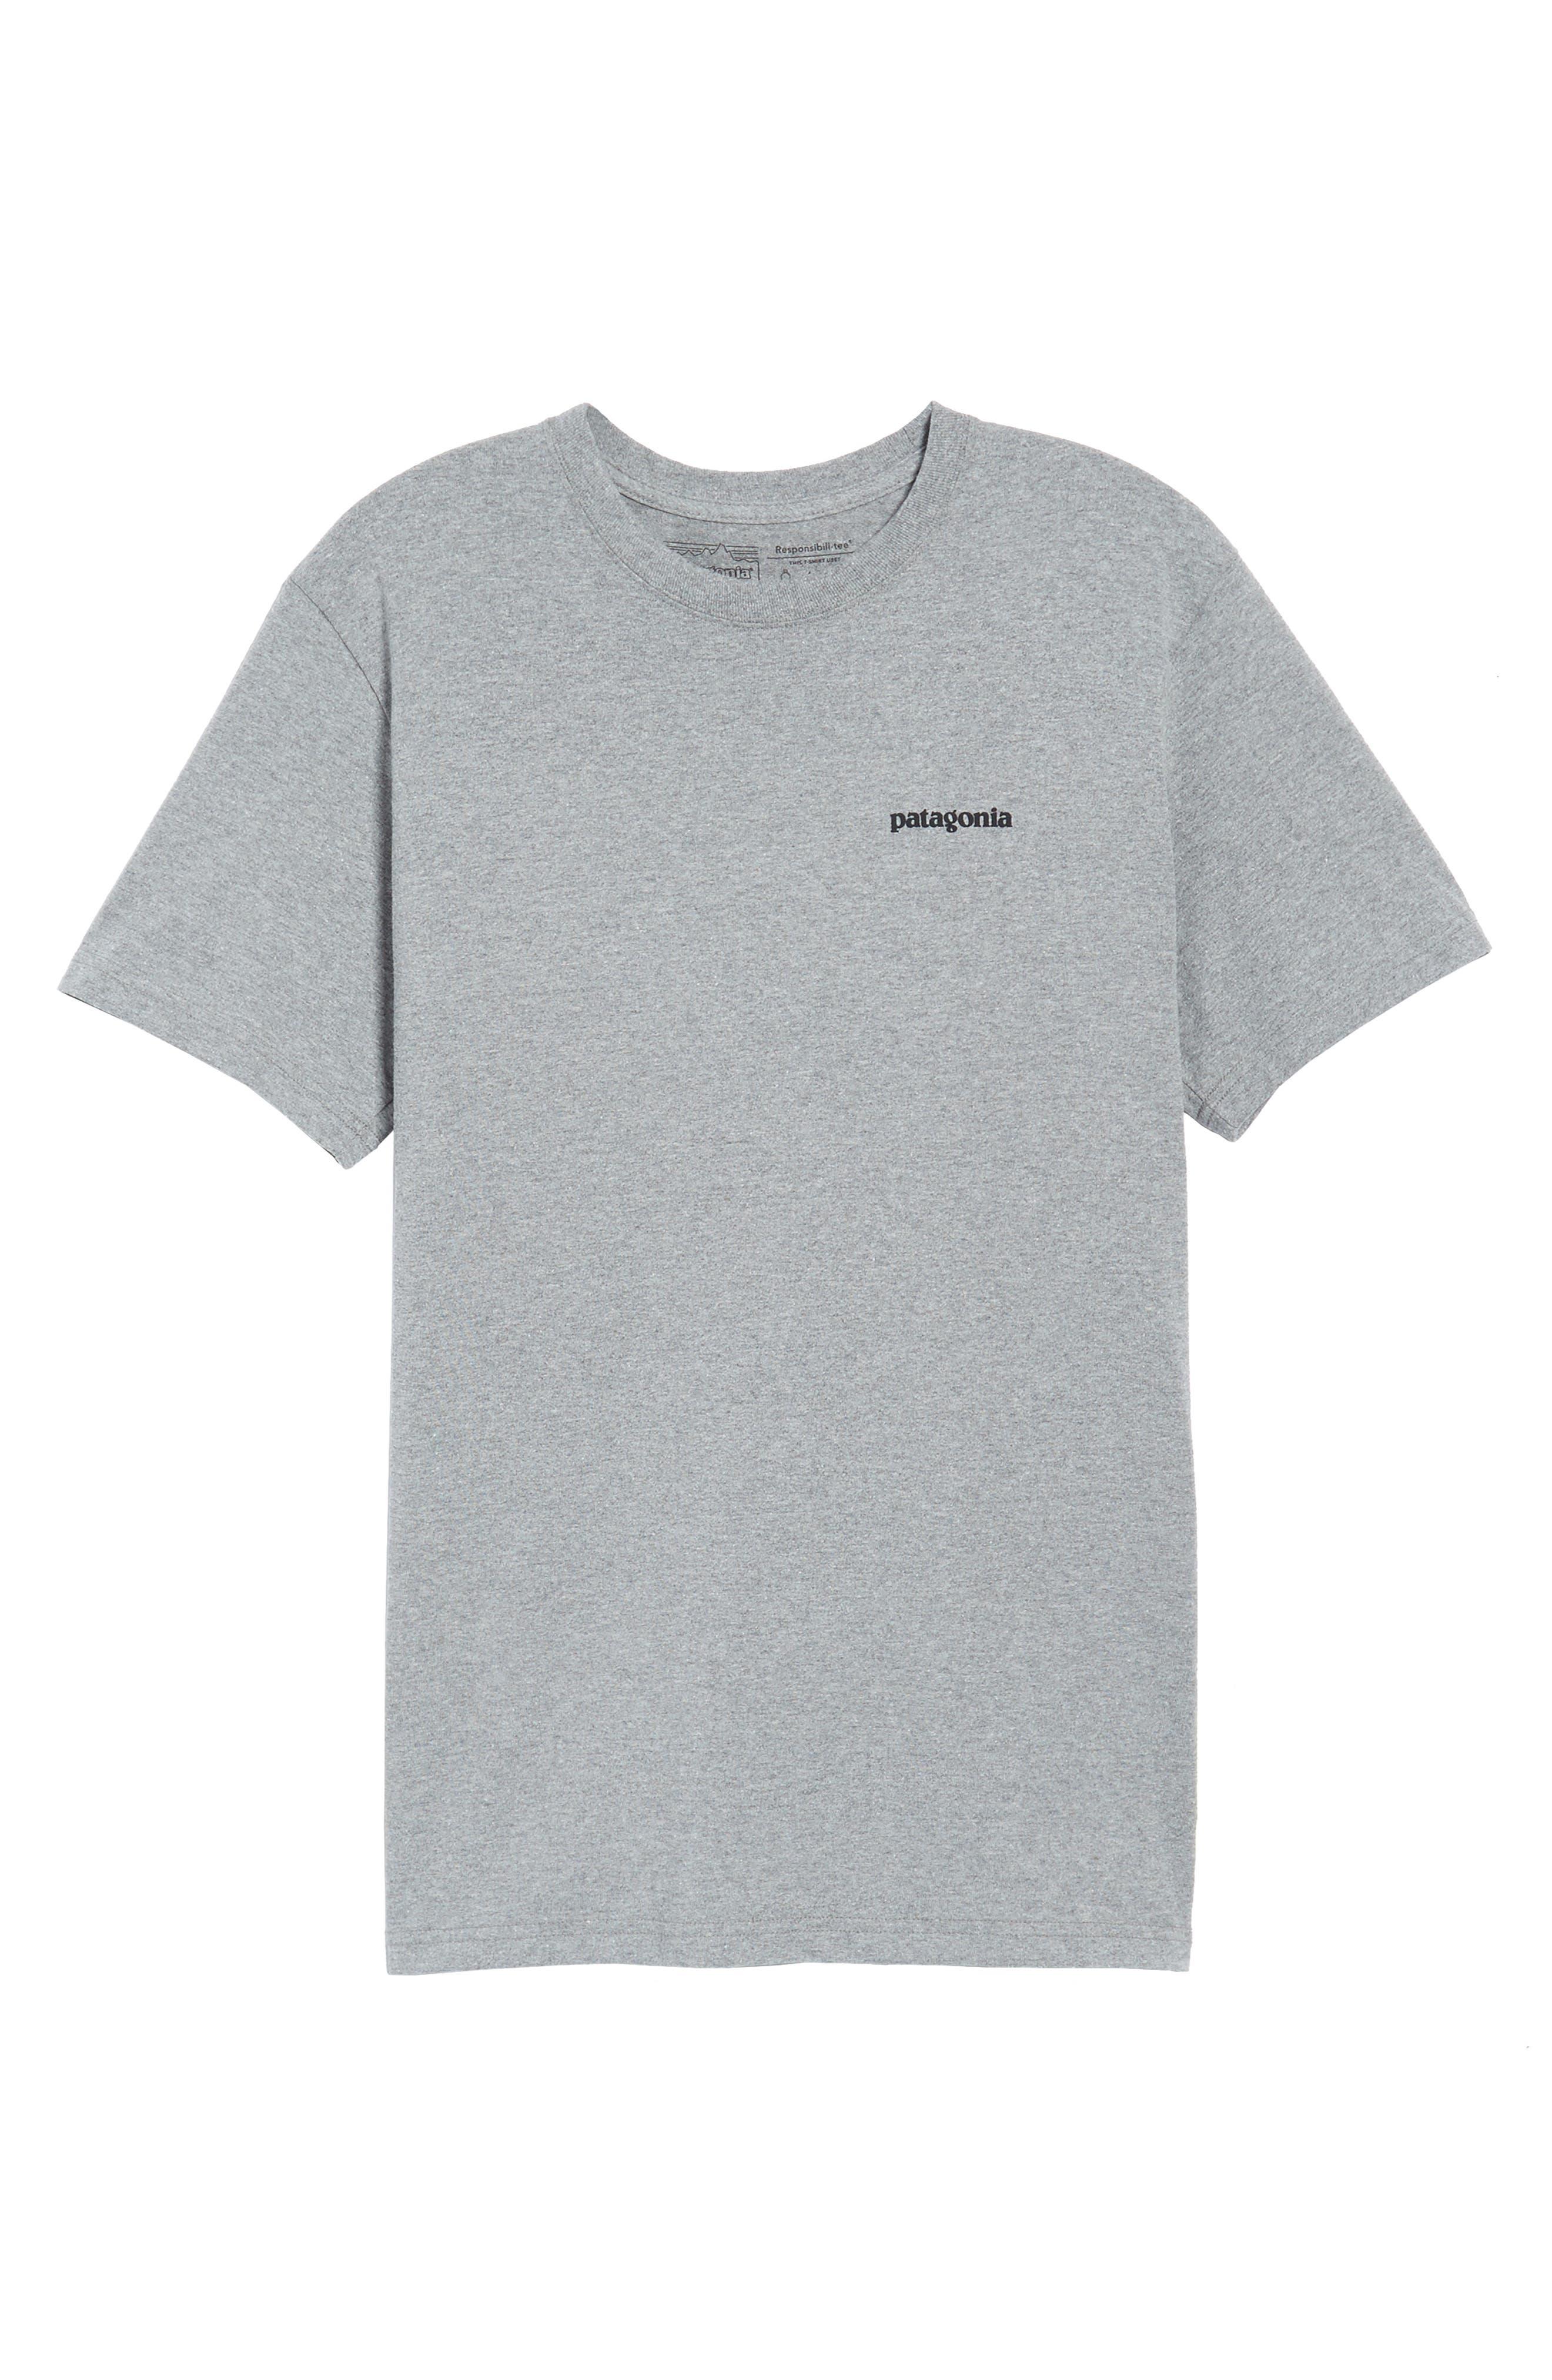 Glacier View Rising Responsibili-Tee T-Shirt,                             Alternate thumbnail 6, color,                             020